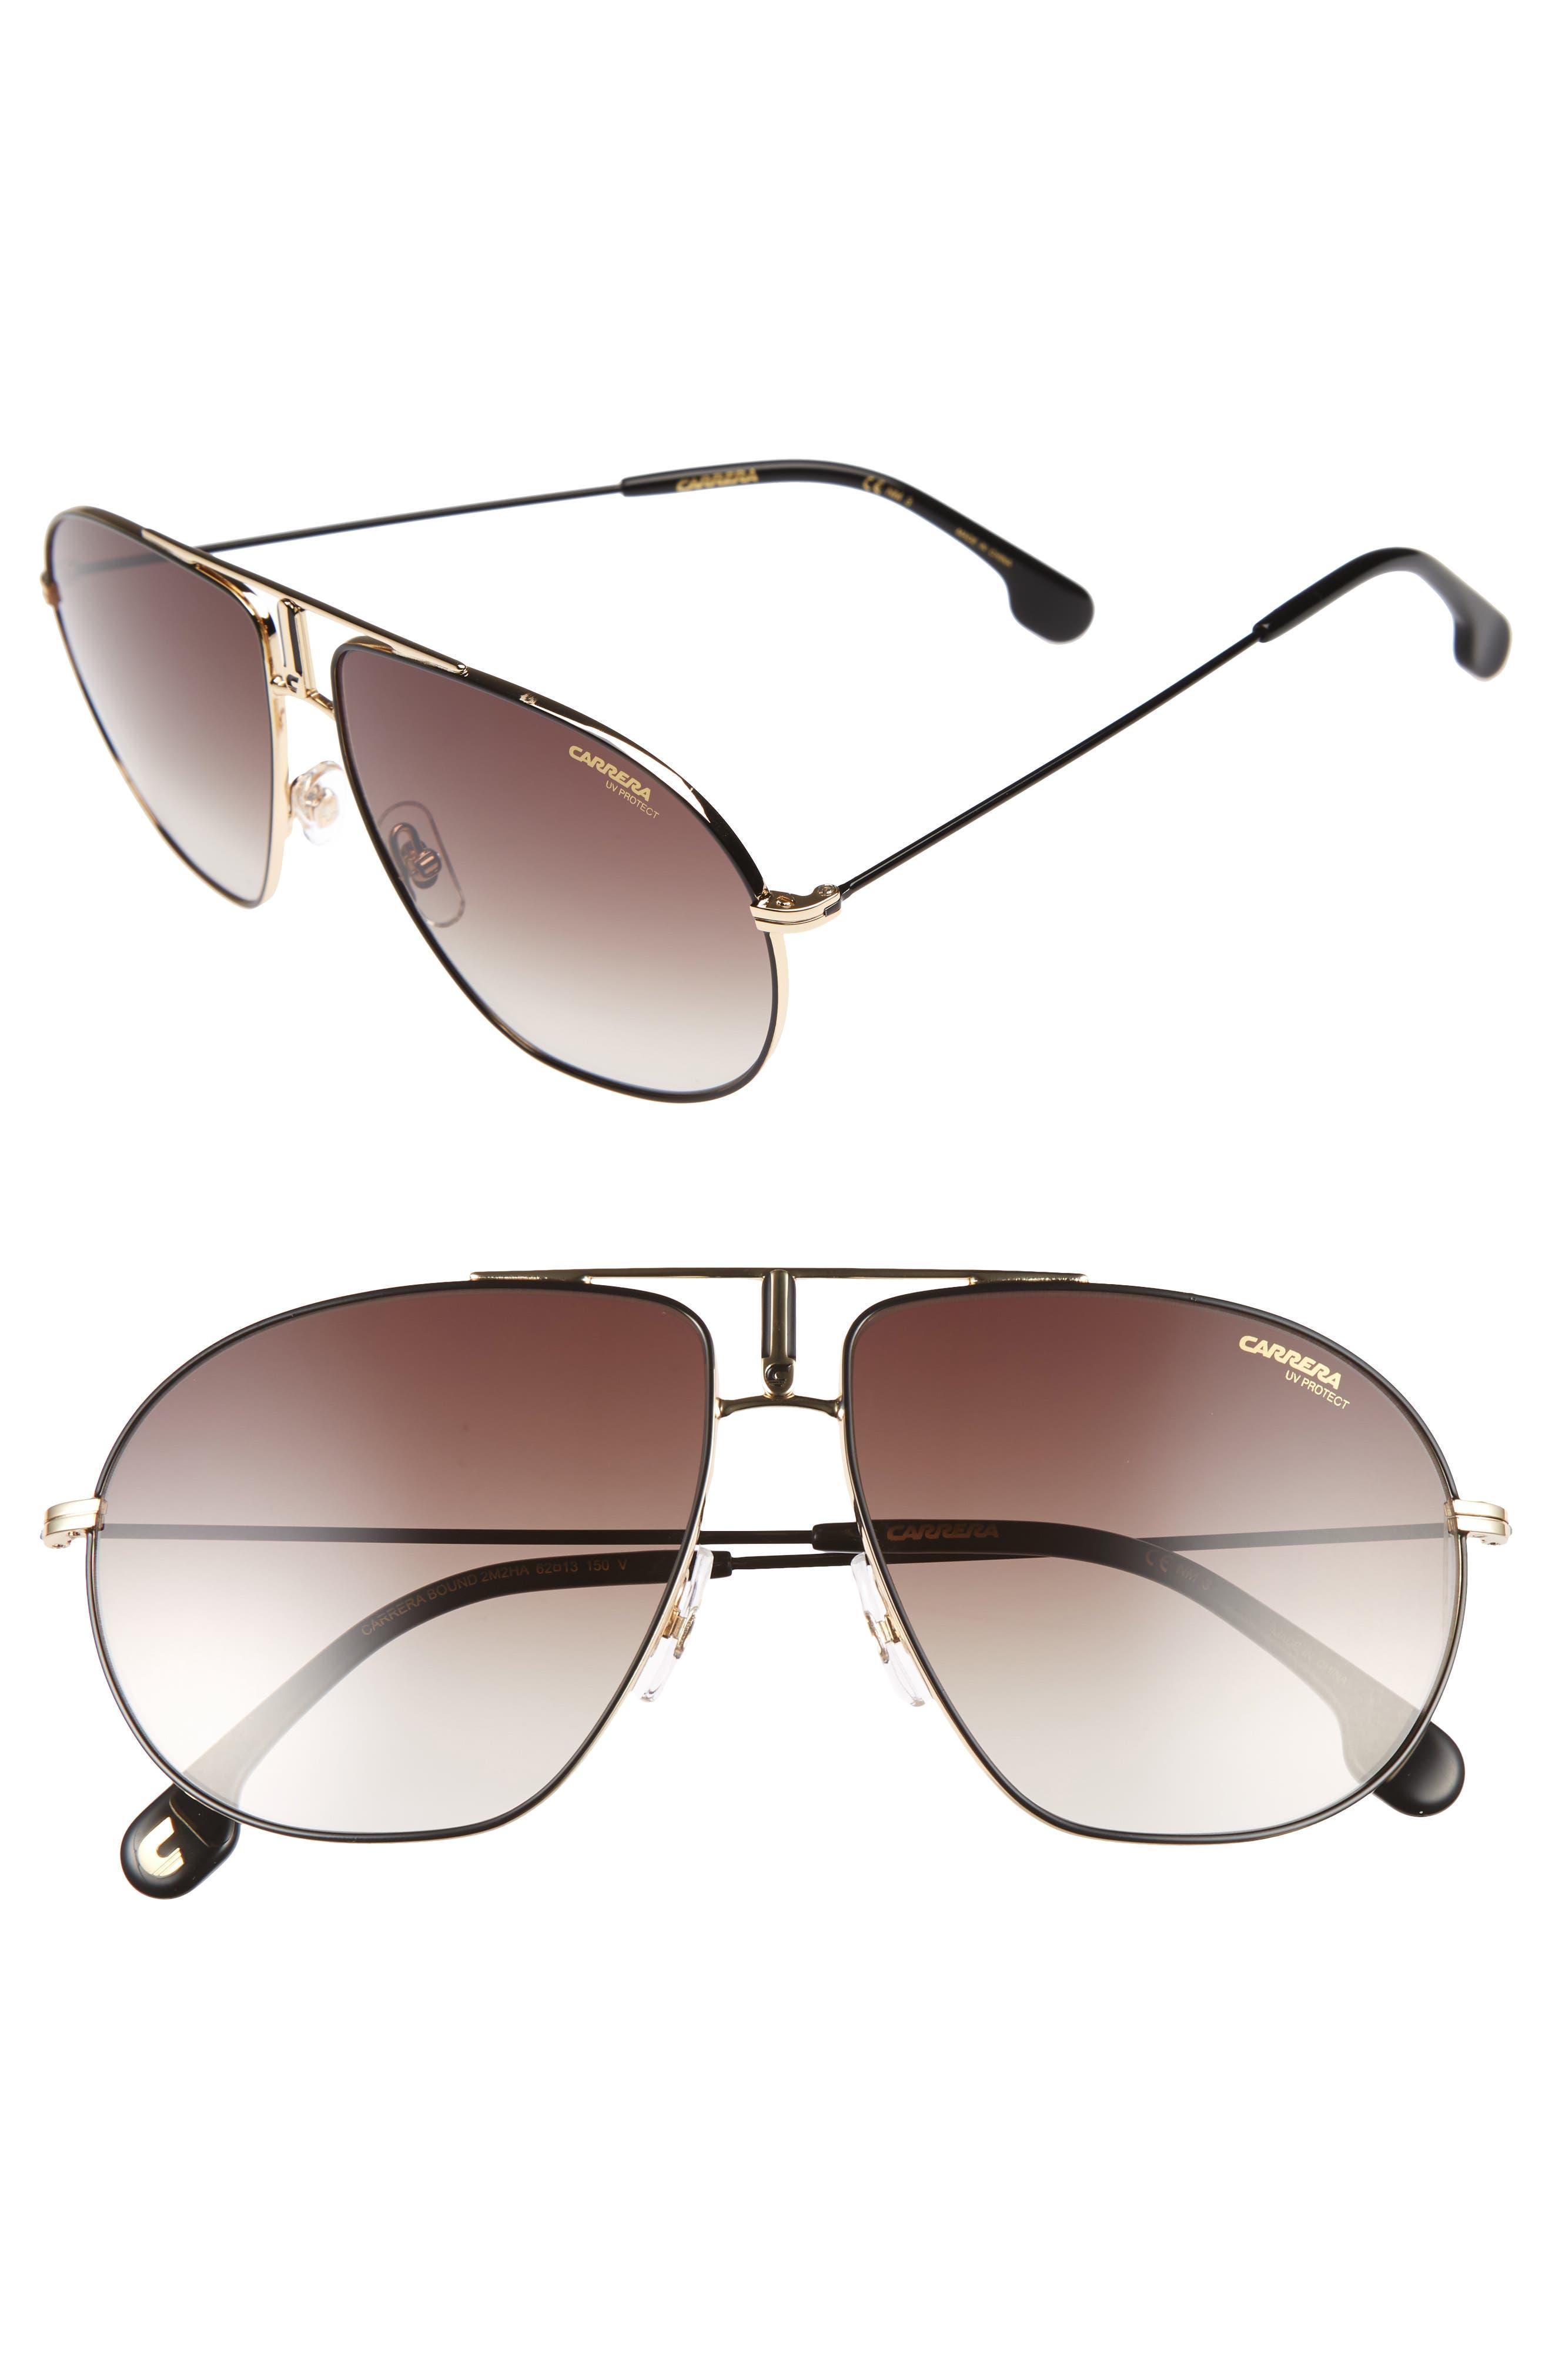 Carrera Eyewear Bounds 62mm Gradient Aviator Sunglasses